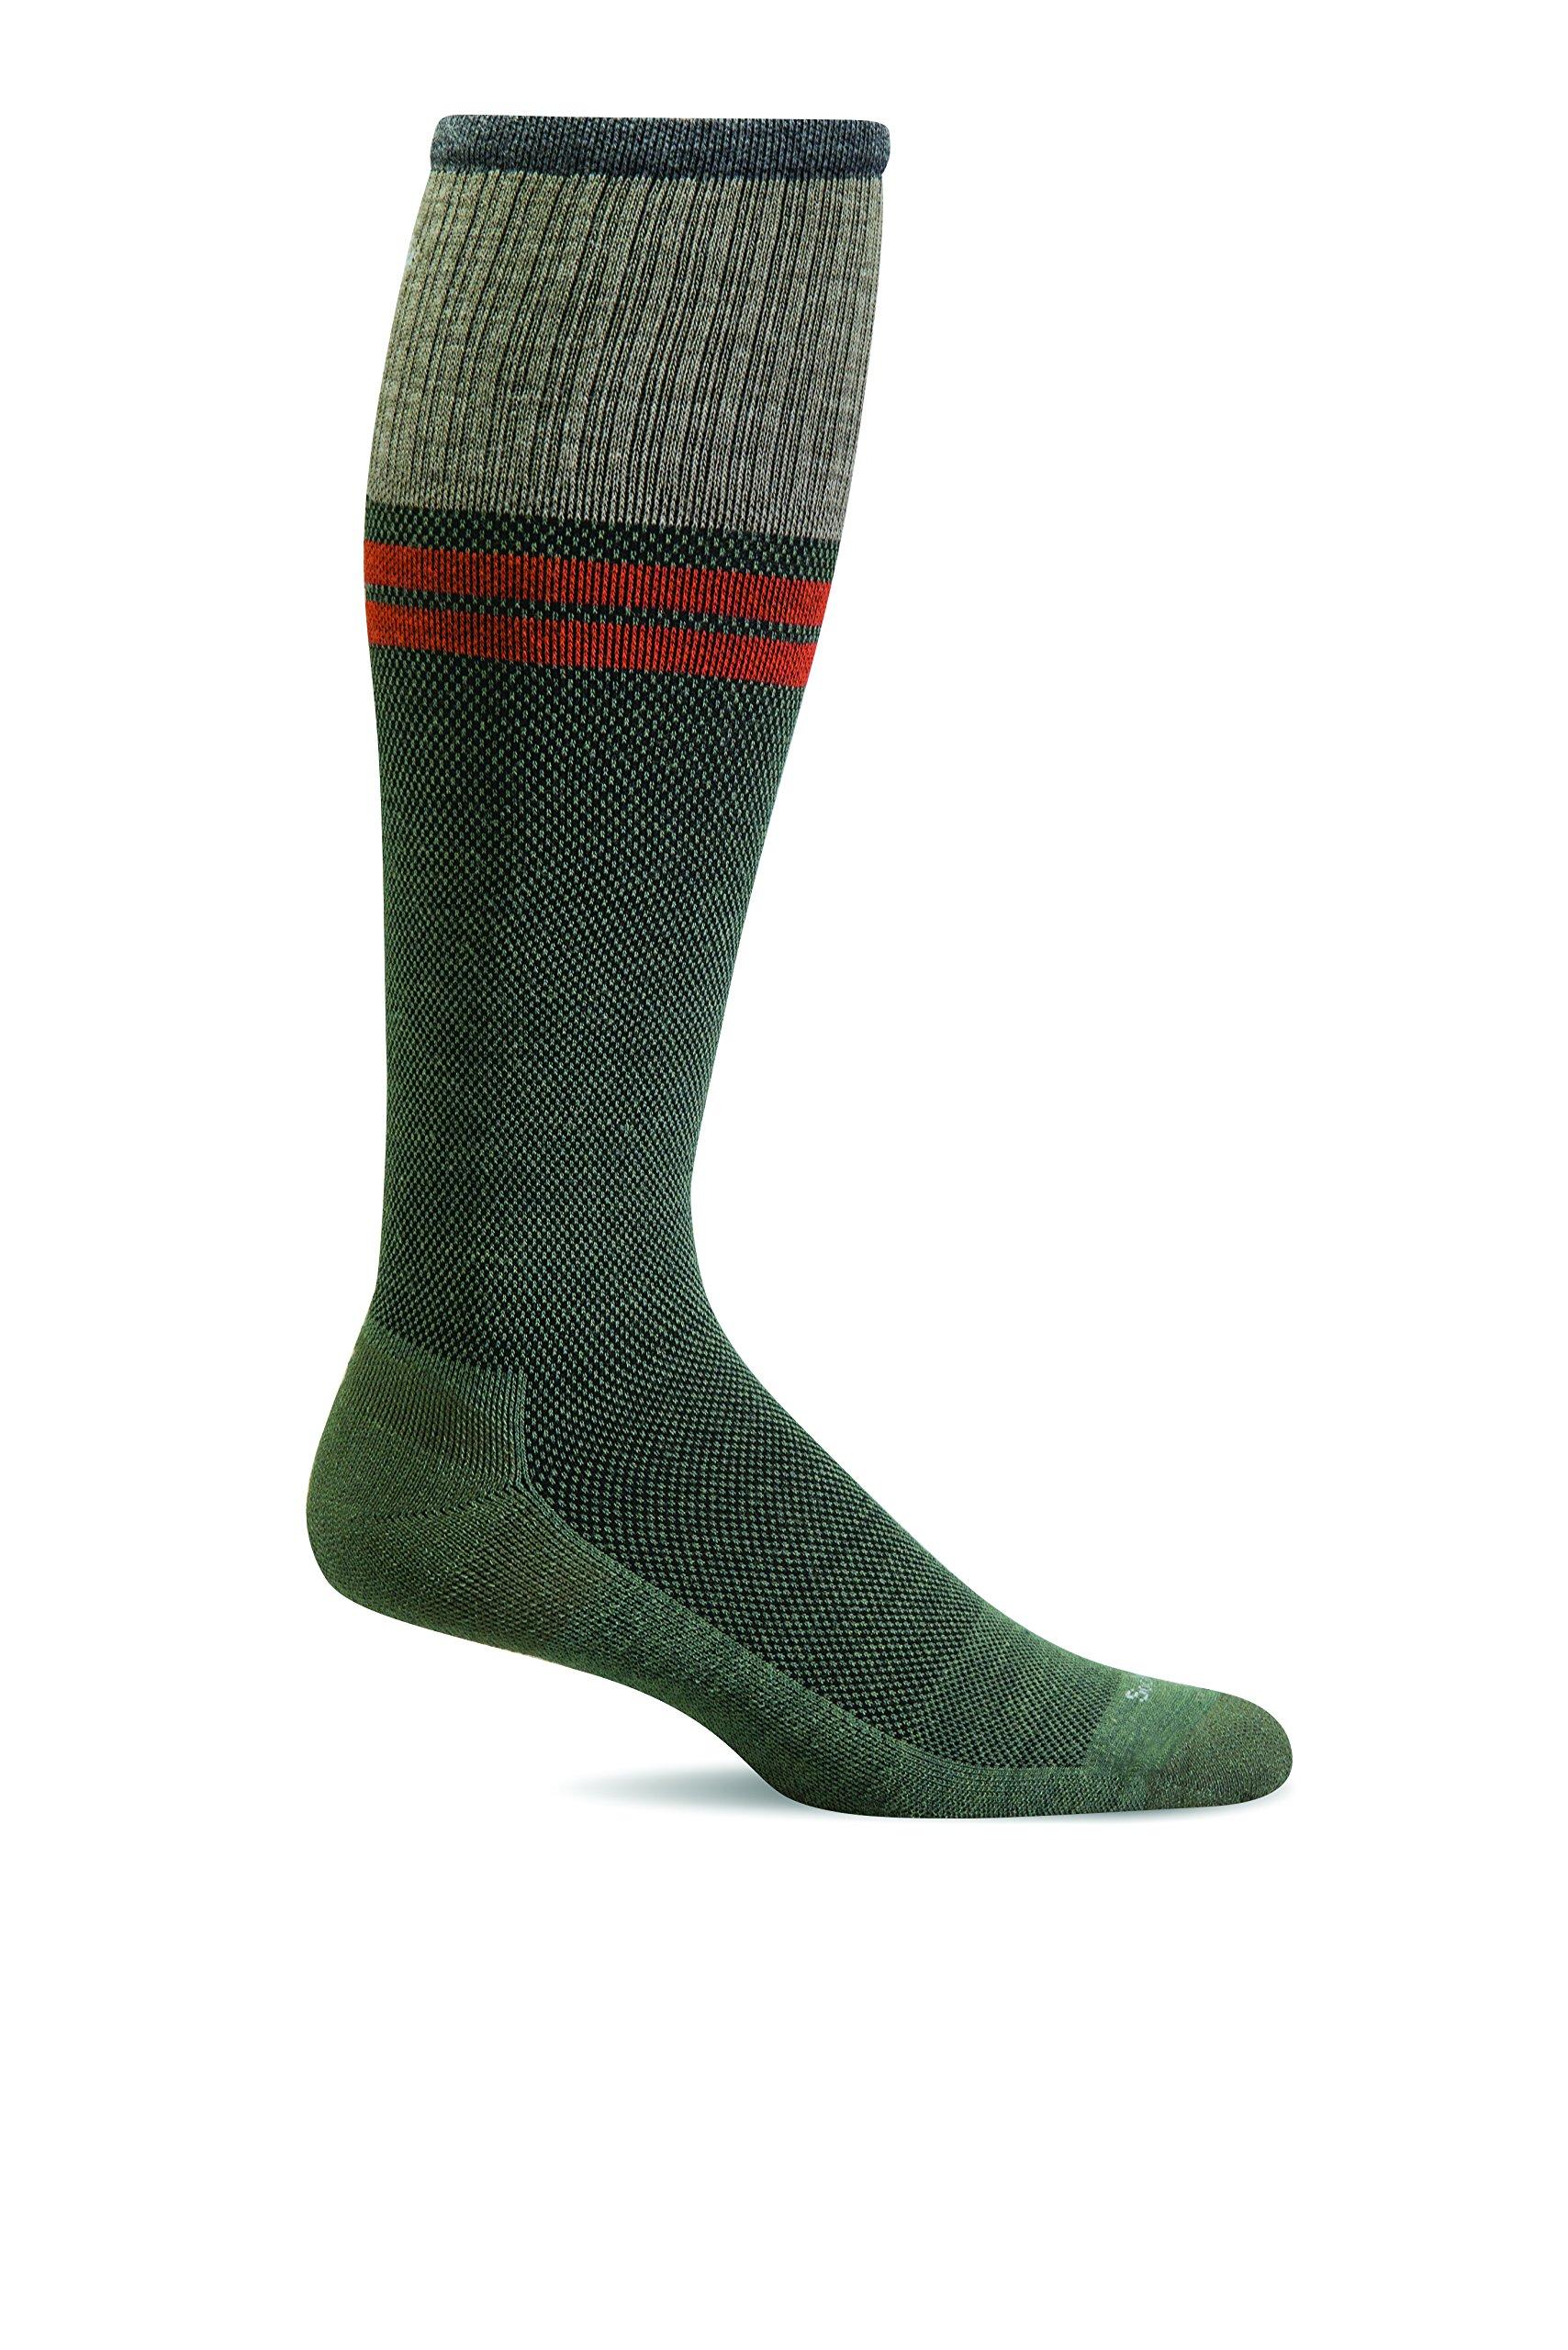 Sockwell Mens Wool Moderate Sportster Compression Socks (Eucalyptus, M/L)